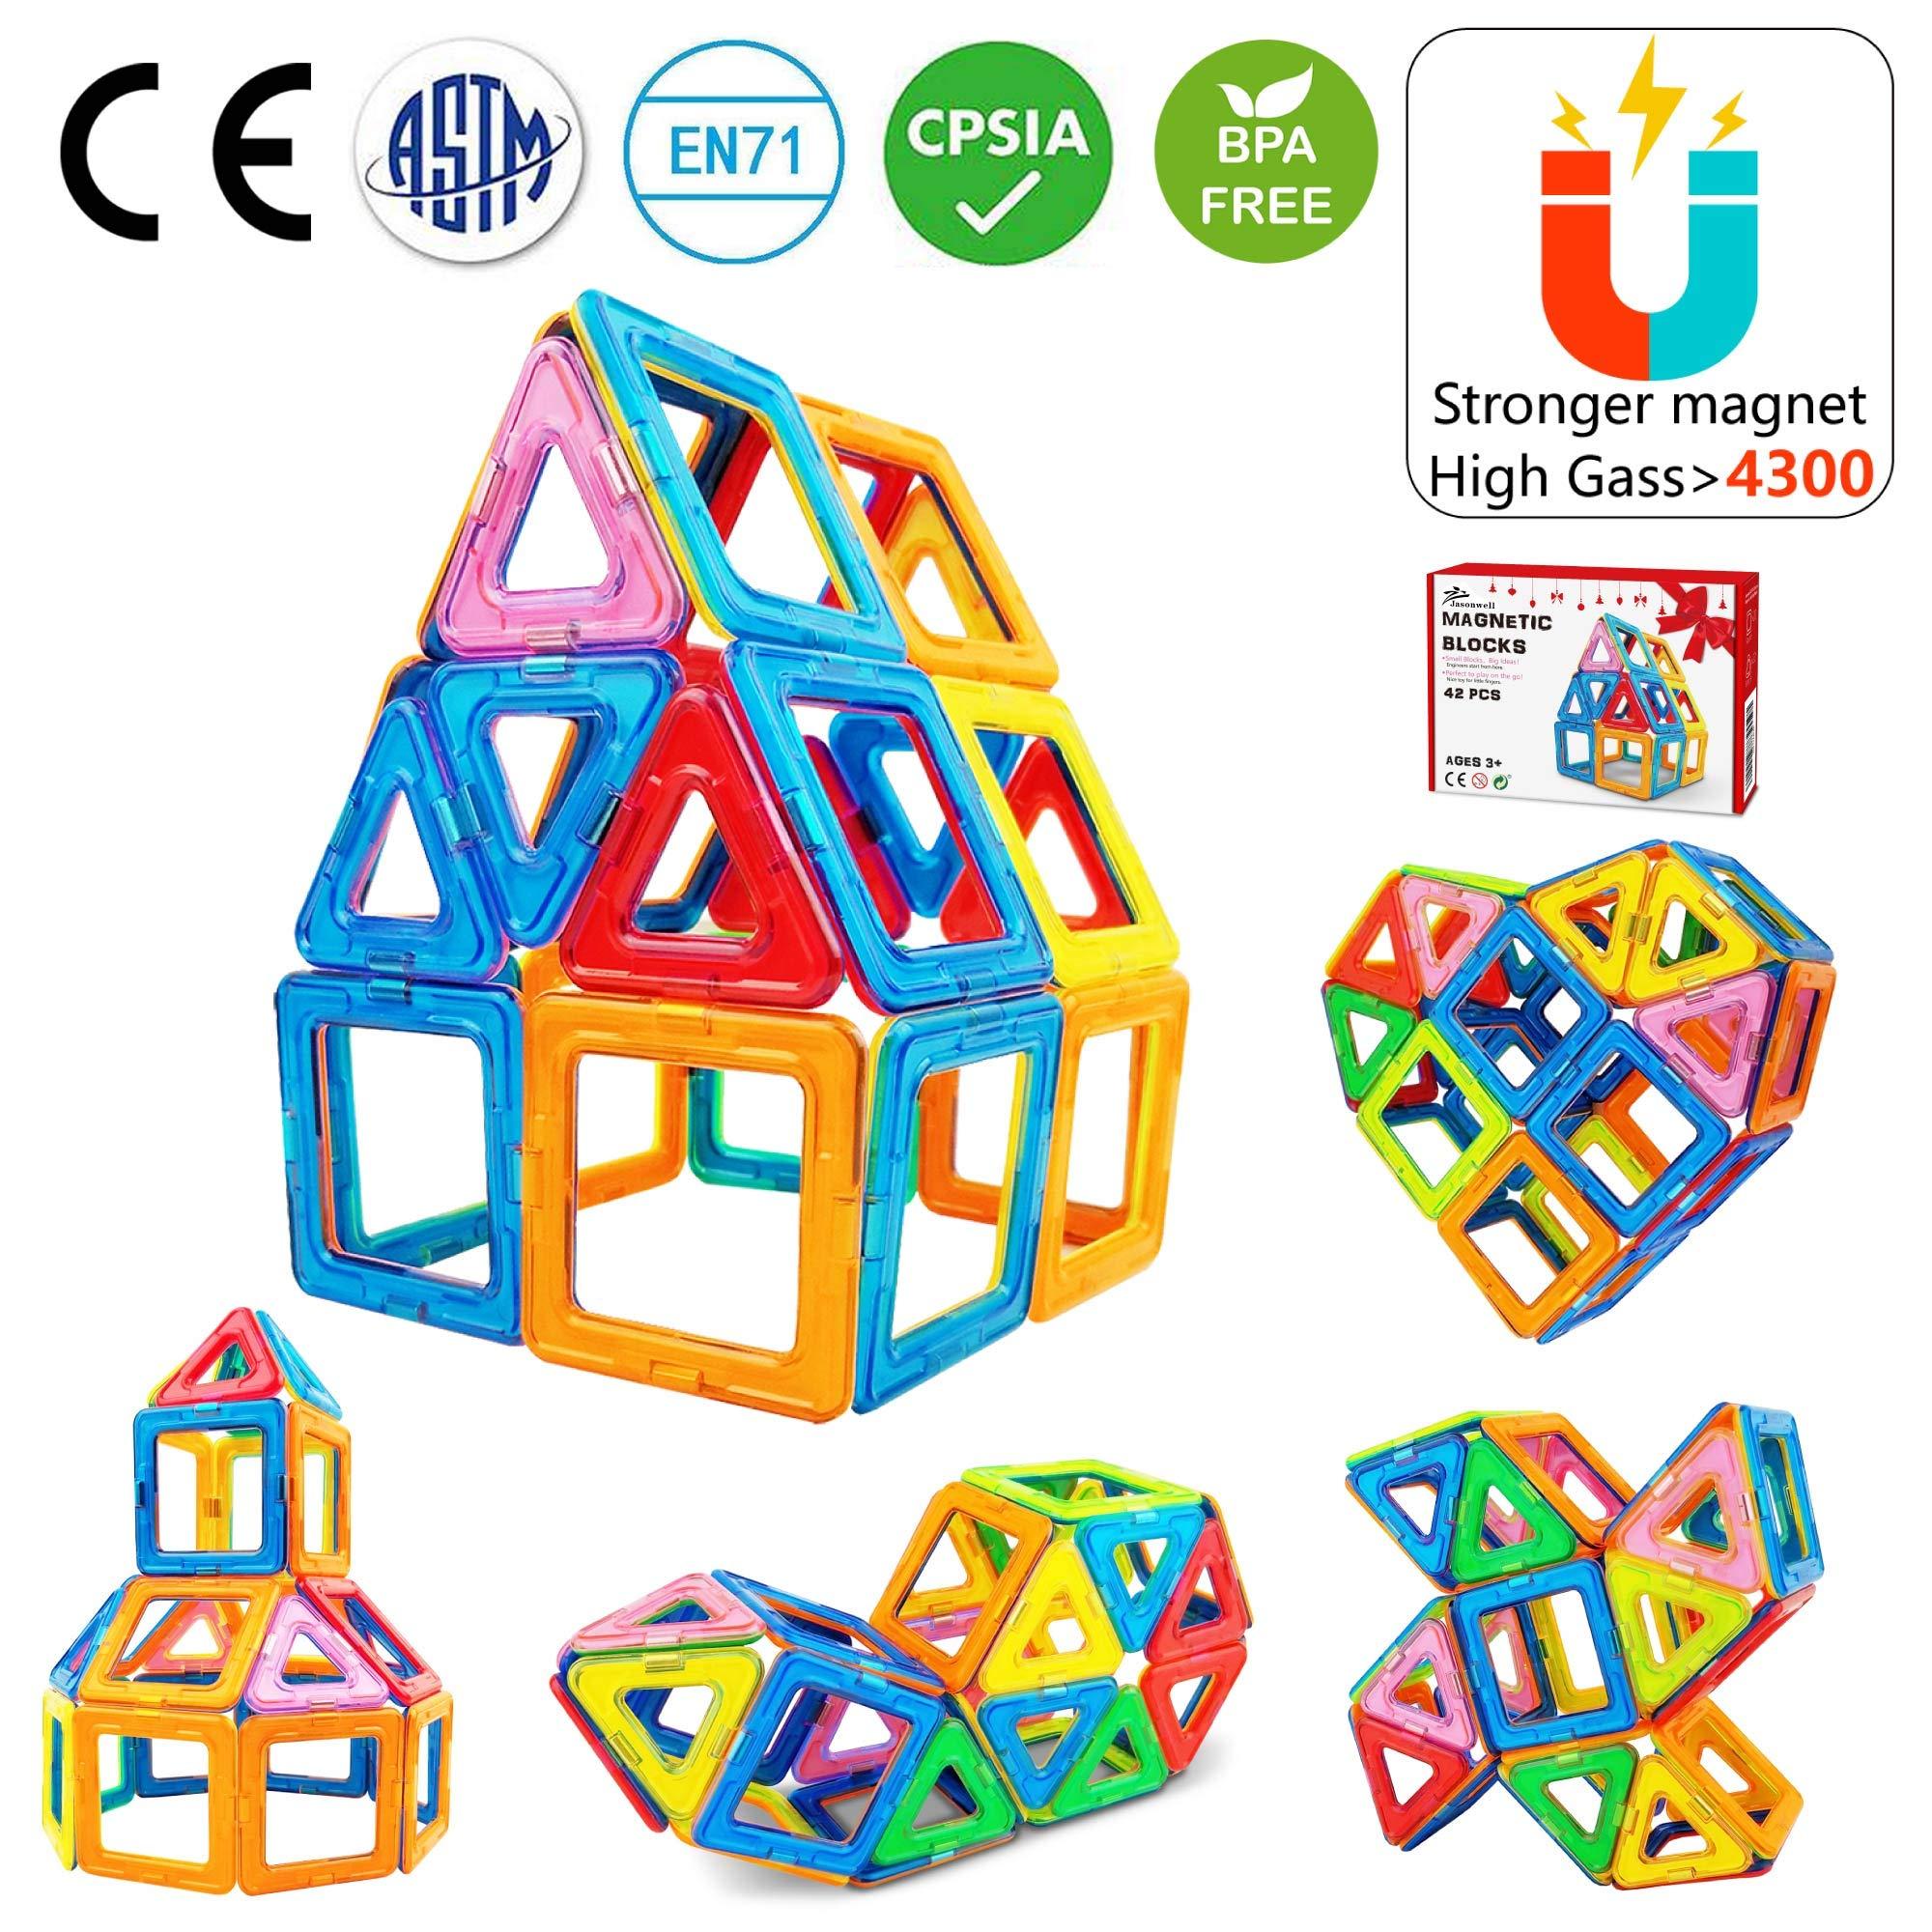 Jasonwell Magnetic Building Blocks 42pcs - Magnet Blocks Set Kids Magnetic Toys Preschool Creative Educational Construction Stacking kit Building Magnetic Tiles for Toddlers Children